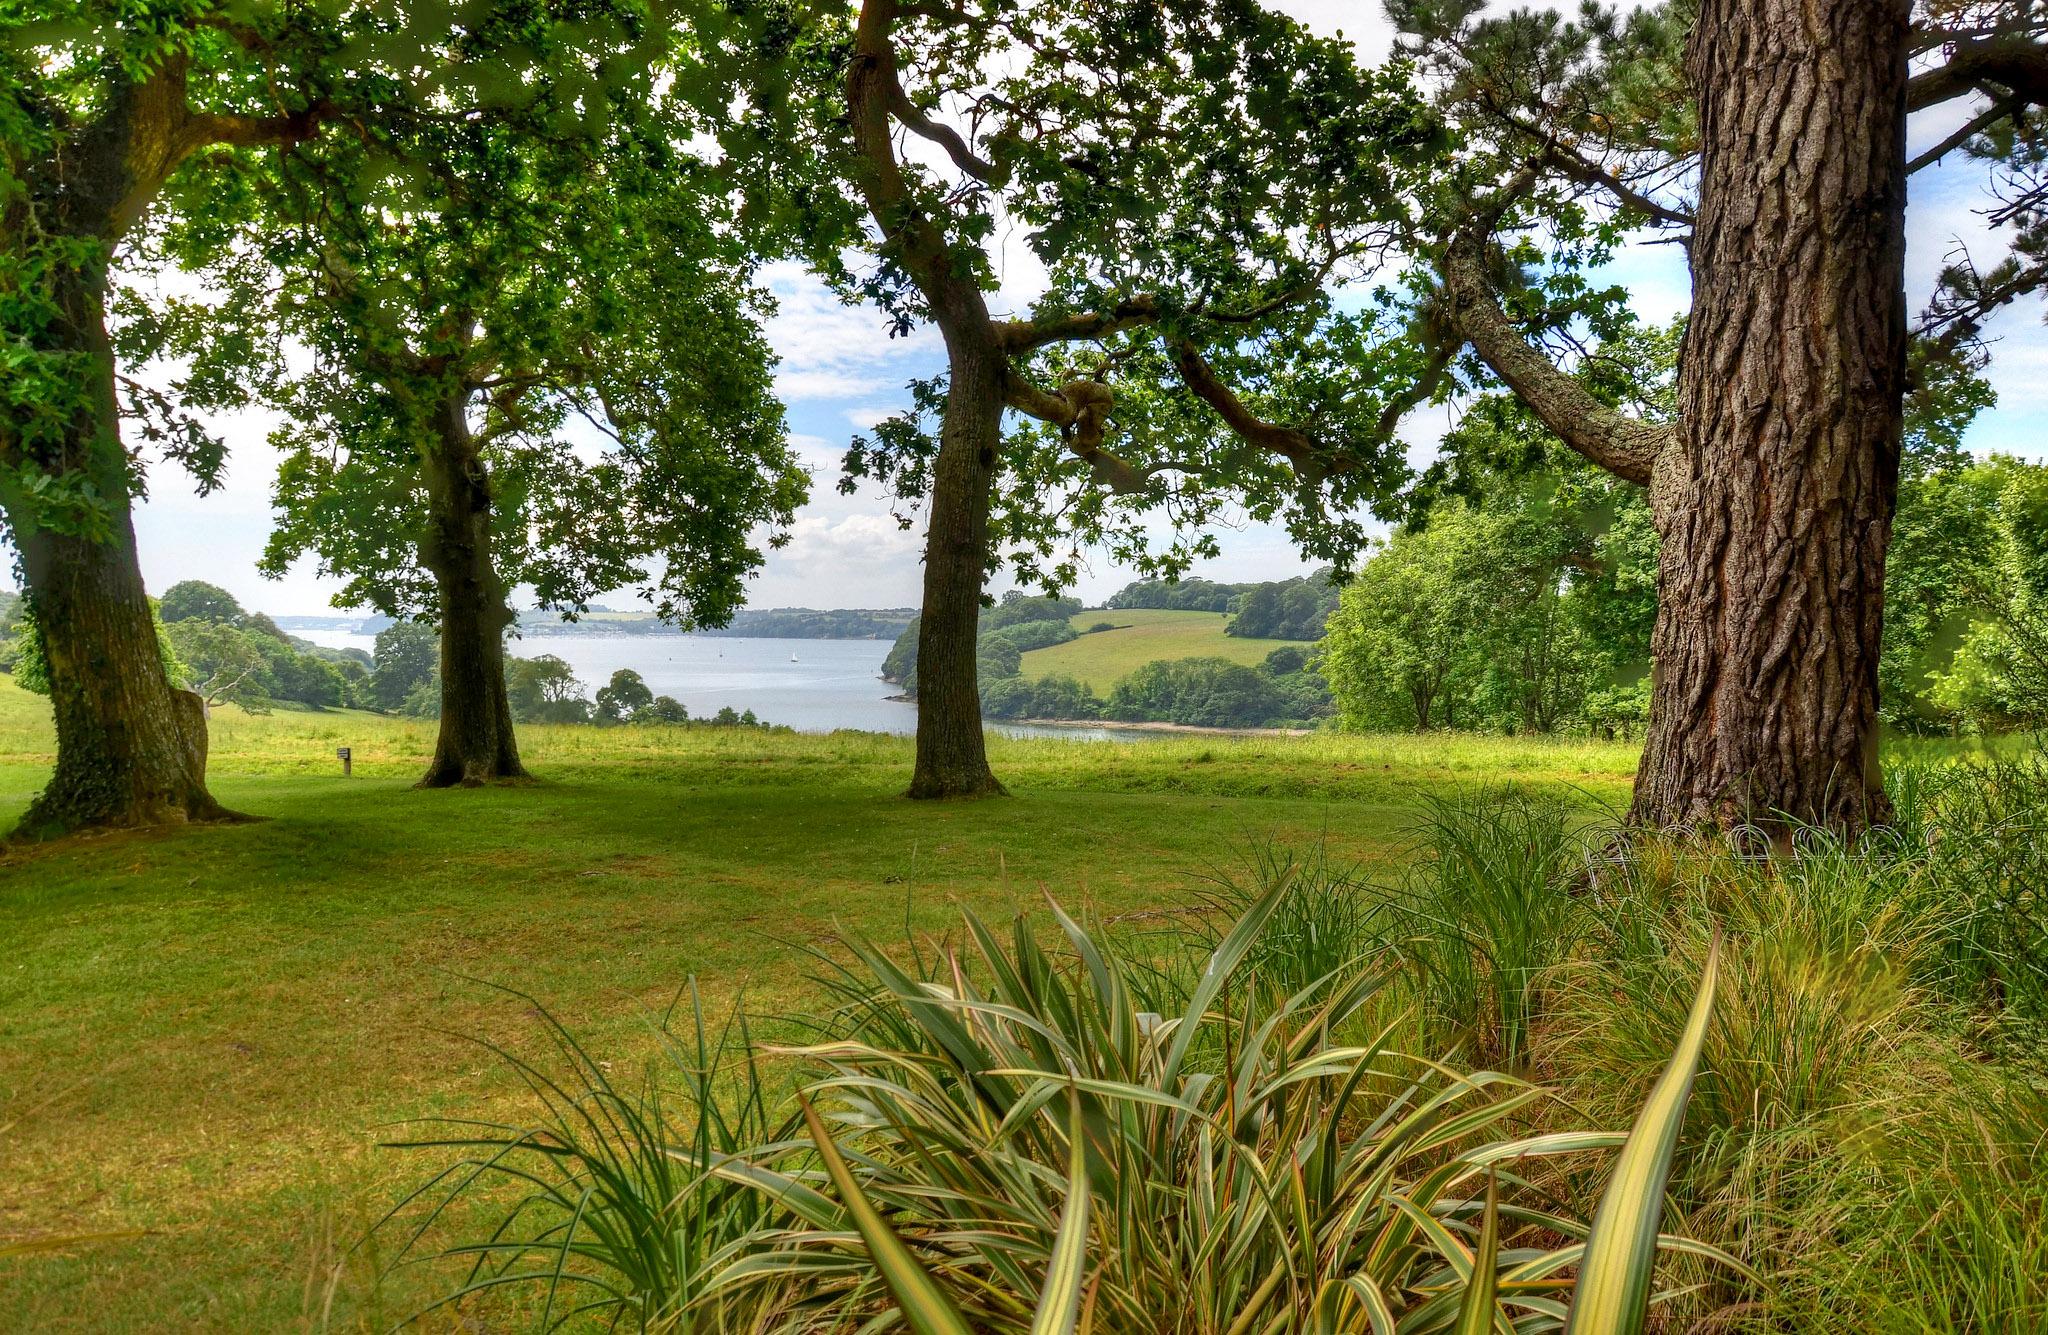 Trelissick Gardens & the River Fal, Cornwall by Baz Richardson.jpg